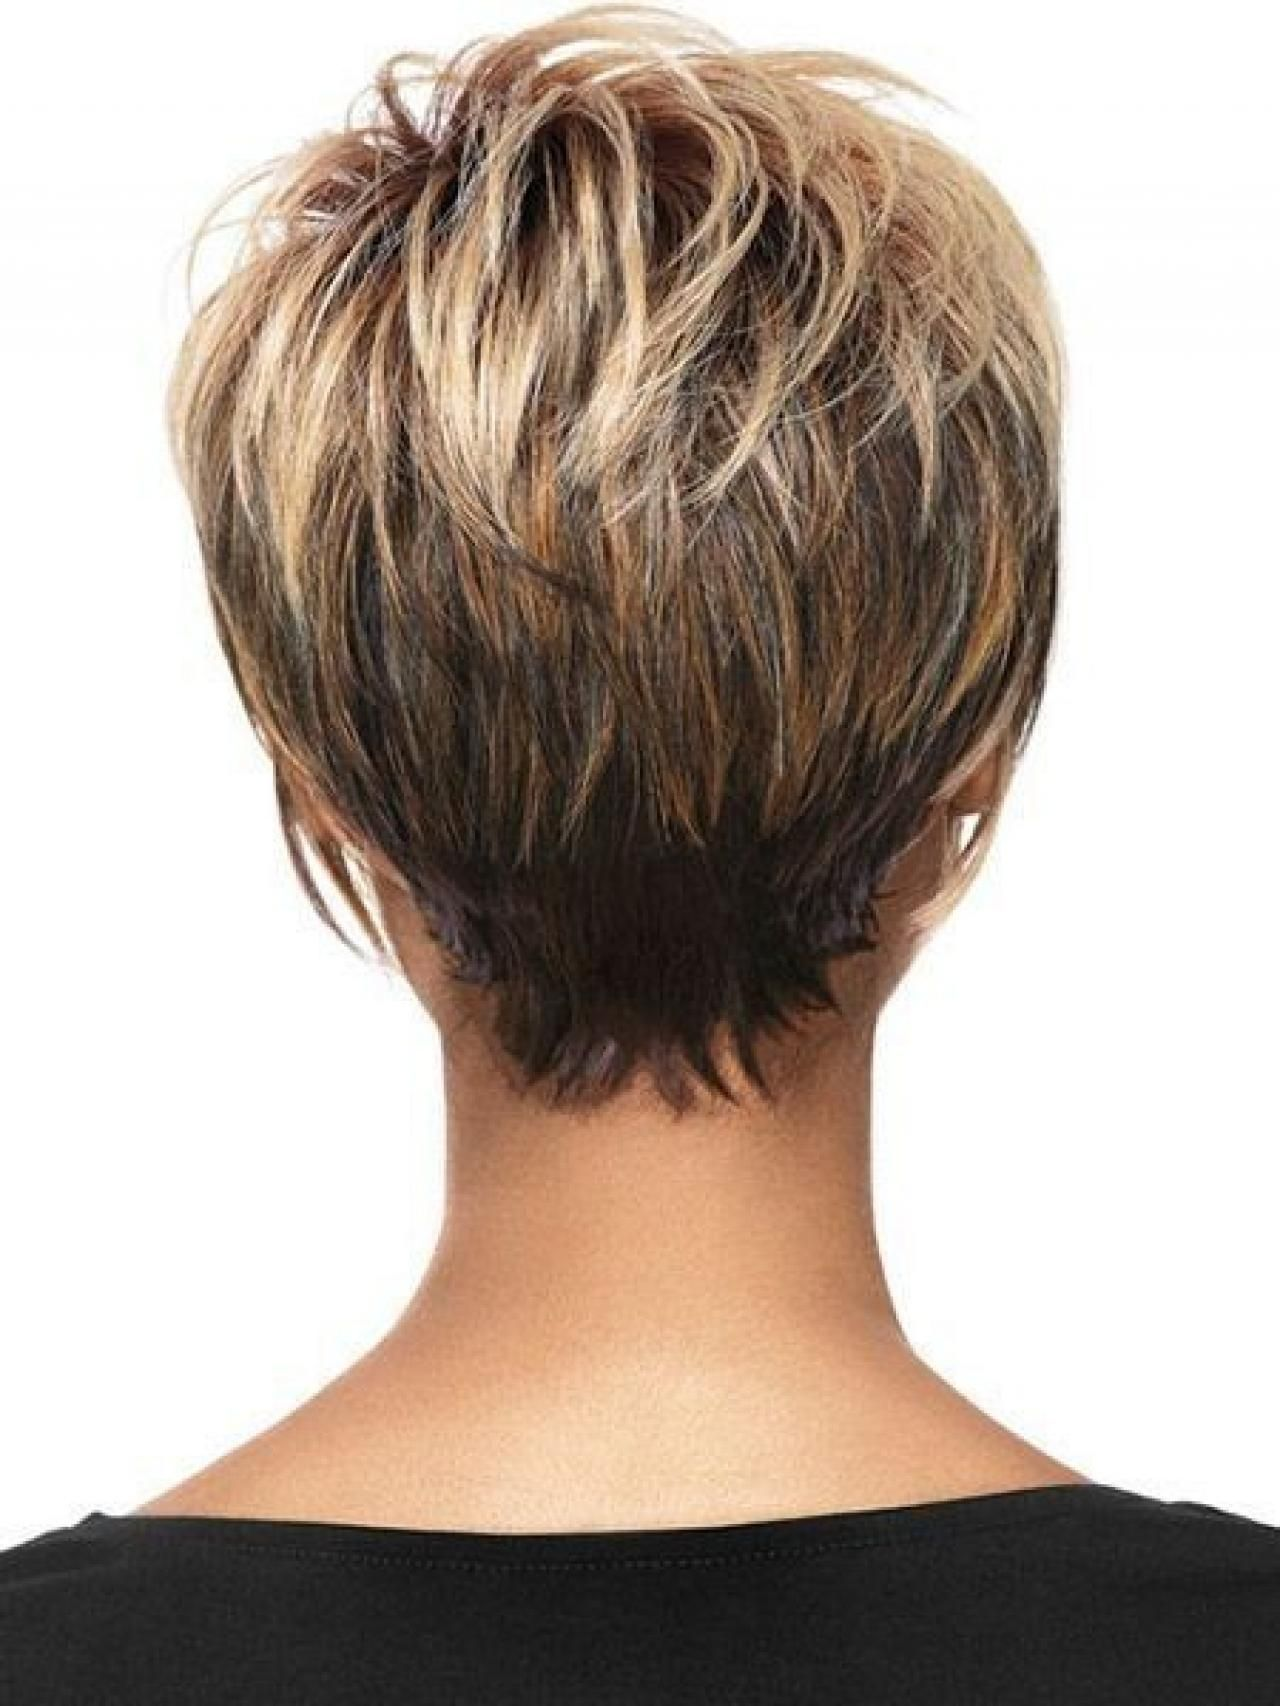 Ombre short hair coiffures originales pinterest ombre short